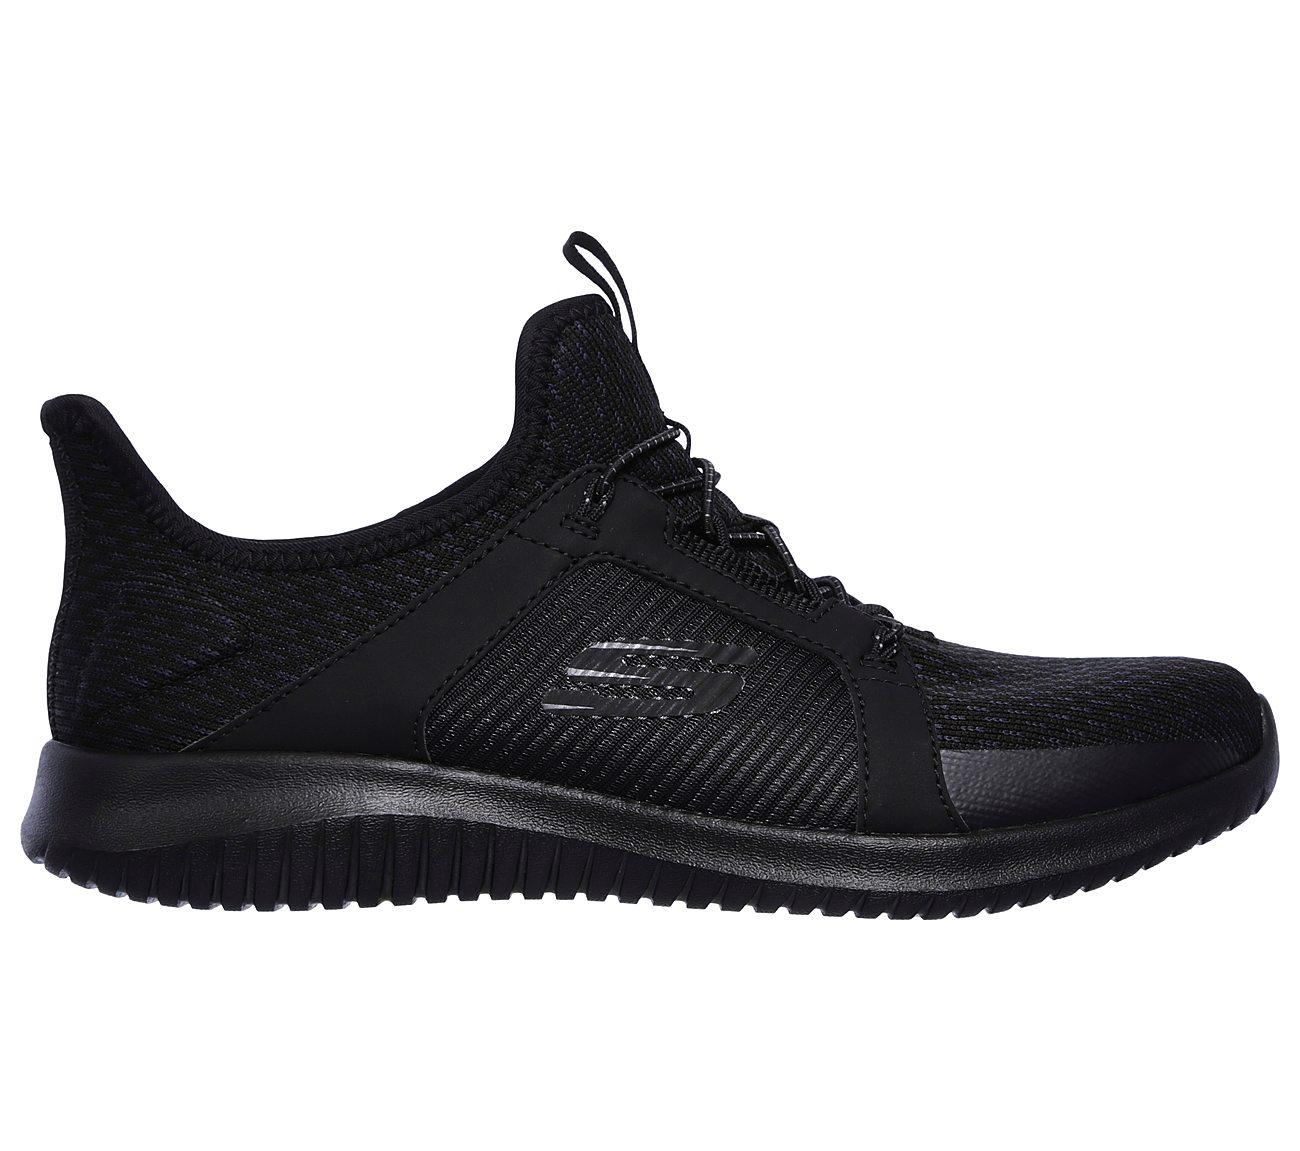 Details about Skechers Womens Ultra Flex Jaw Dropper Memory Foam Shoes Trainers Black